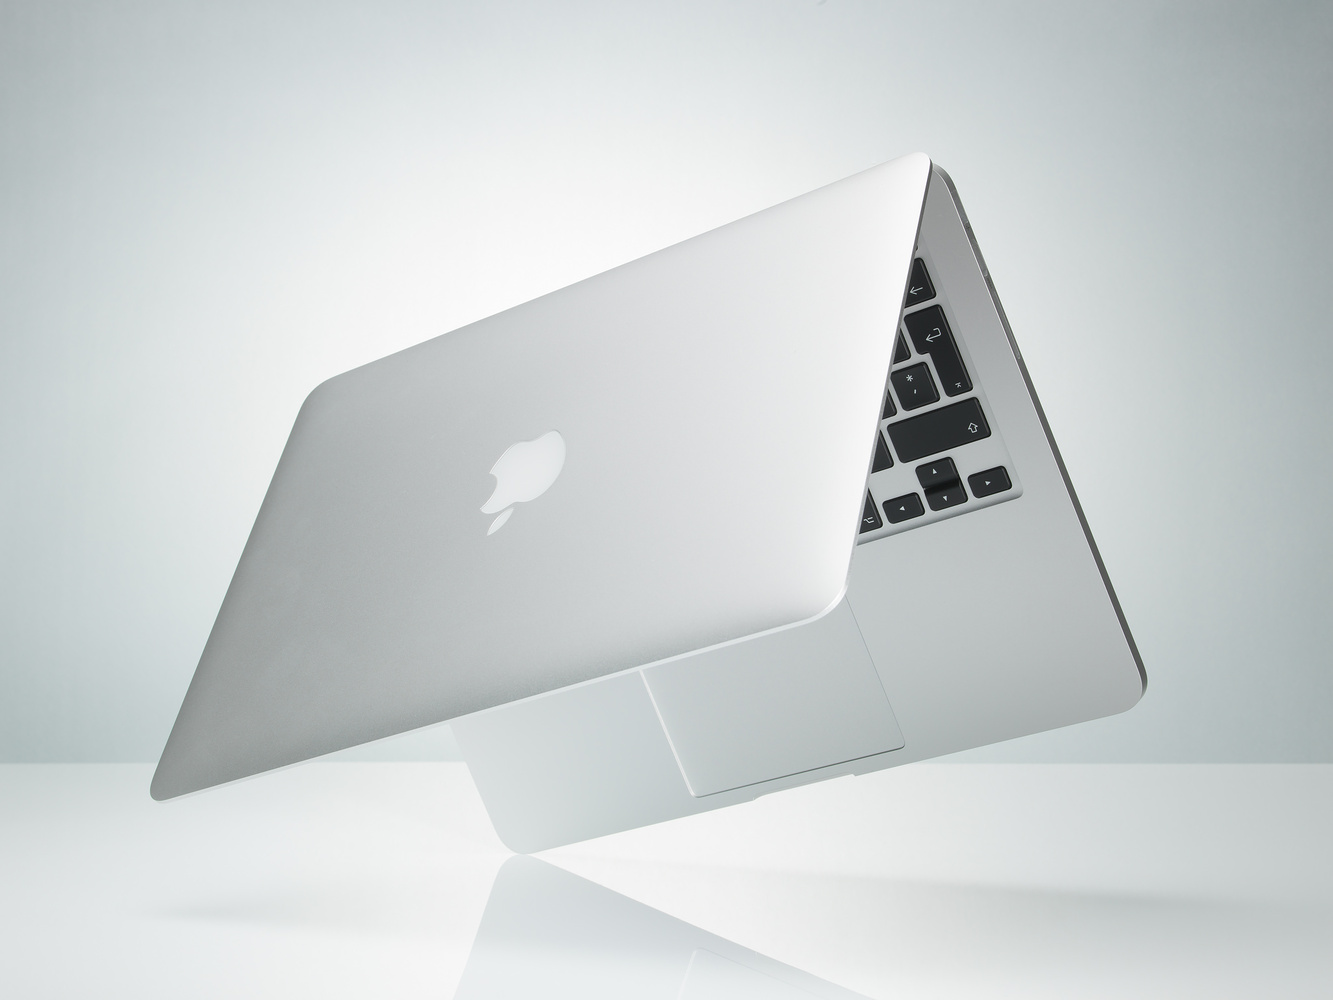 Macbook Pro product shot by Markus Pettersson